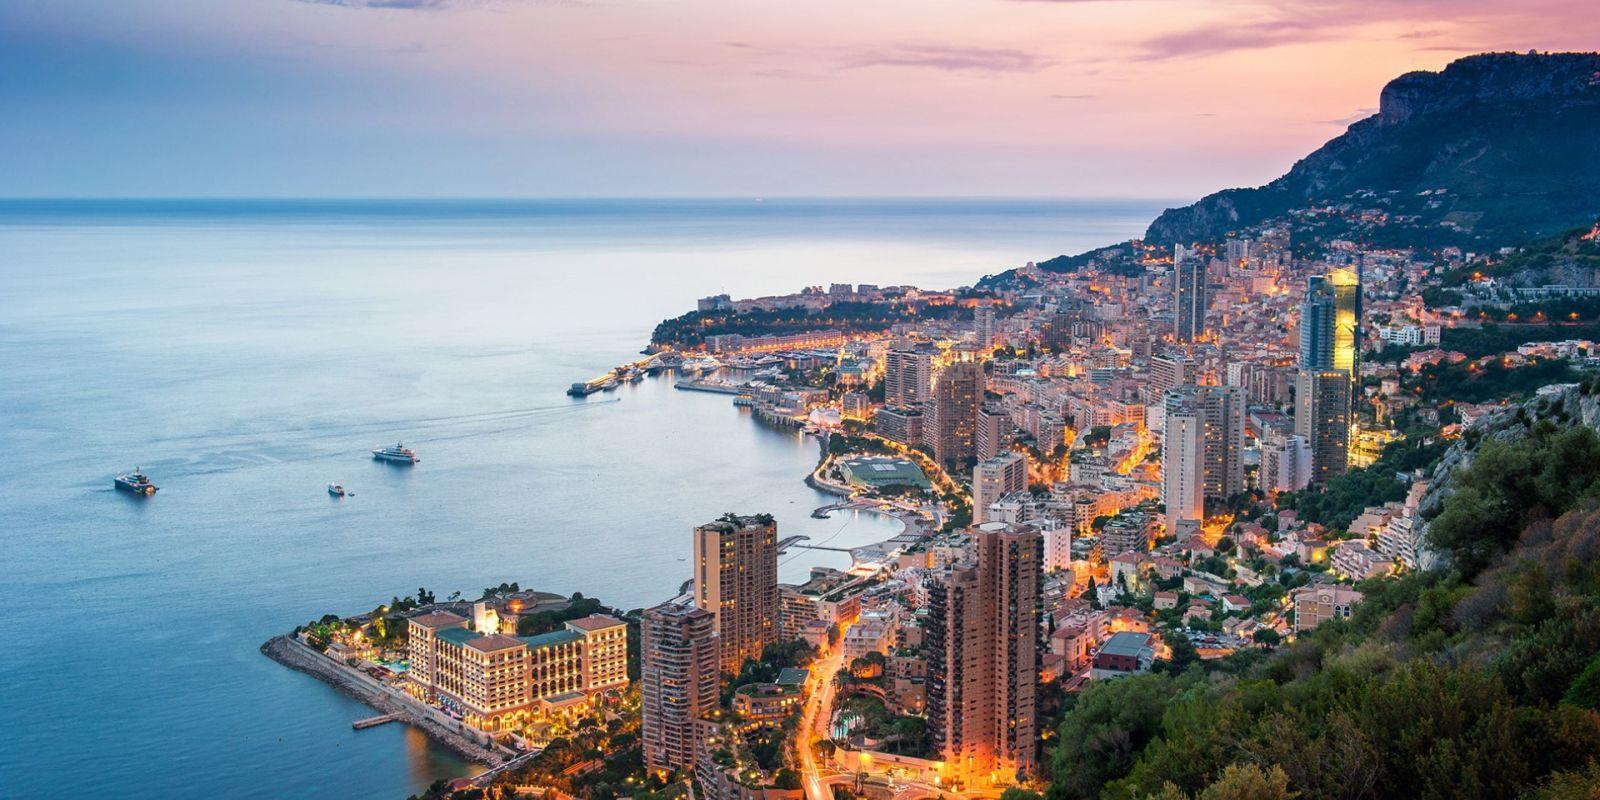 https://www.talamare.com/medias/Aerial view of Monaco by night